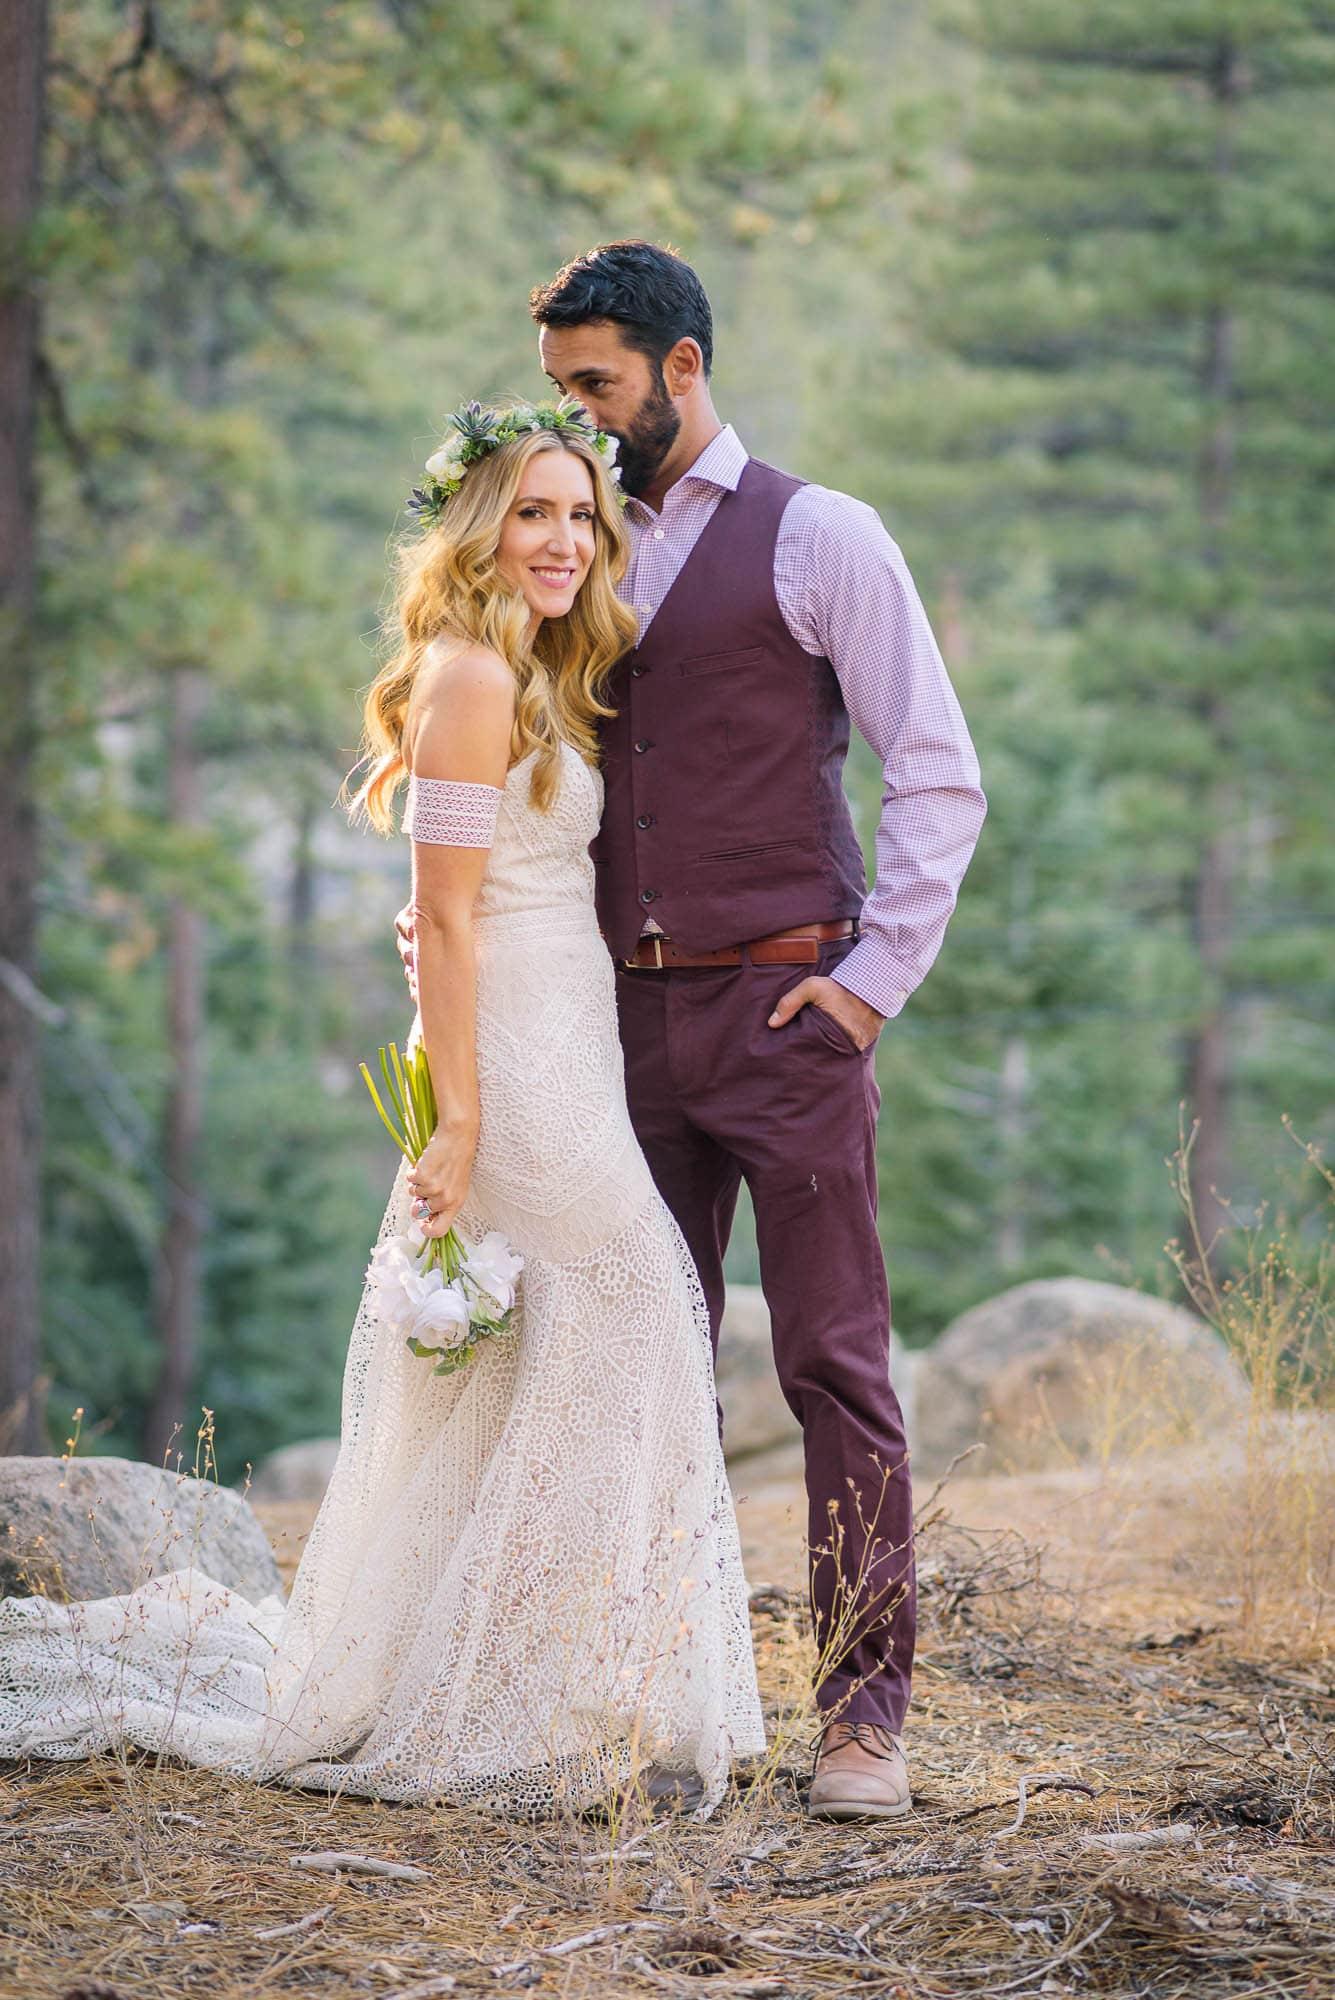 032_Alan_and_Heidi_Wedding_Natalie_Mike